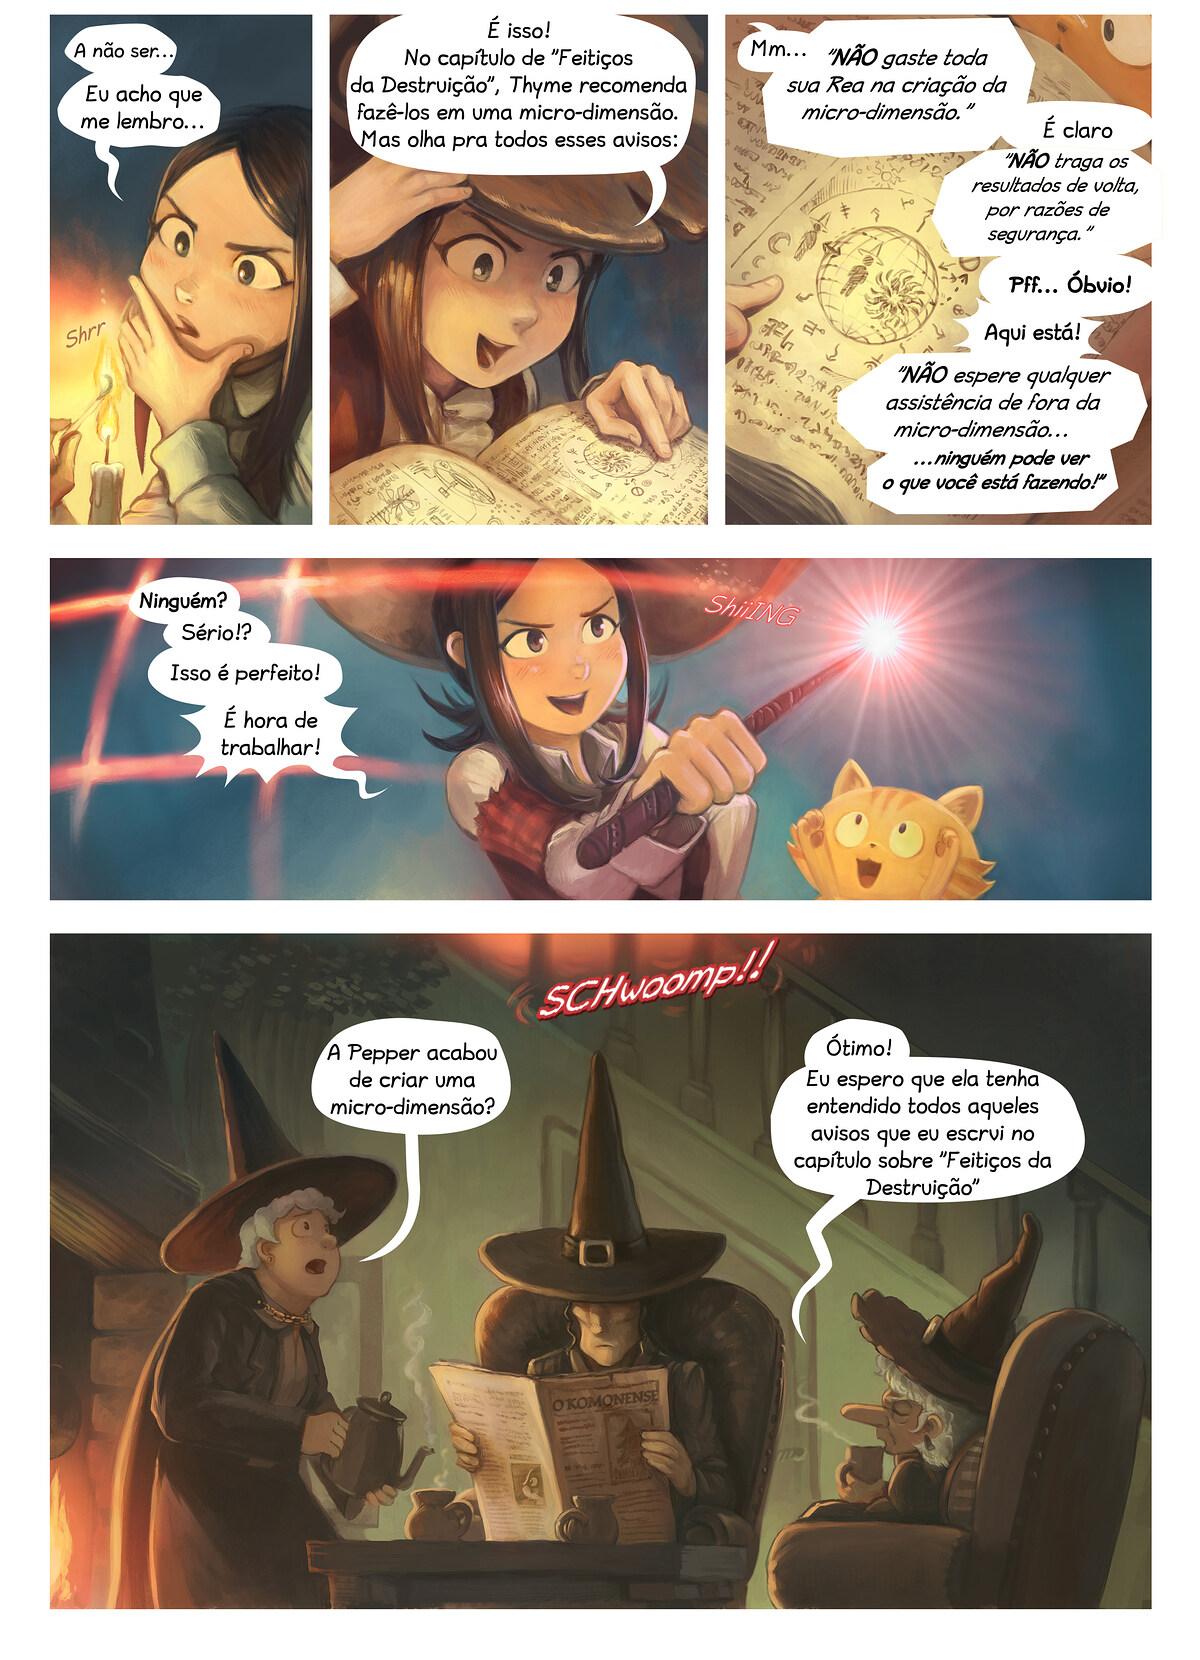 A webcomic page of Pepper&Carrot, episódio 24 [pt], página 3